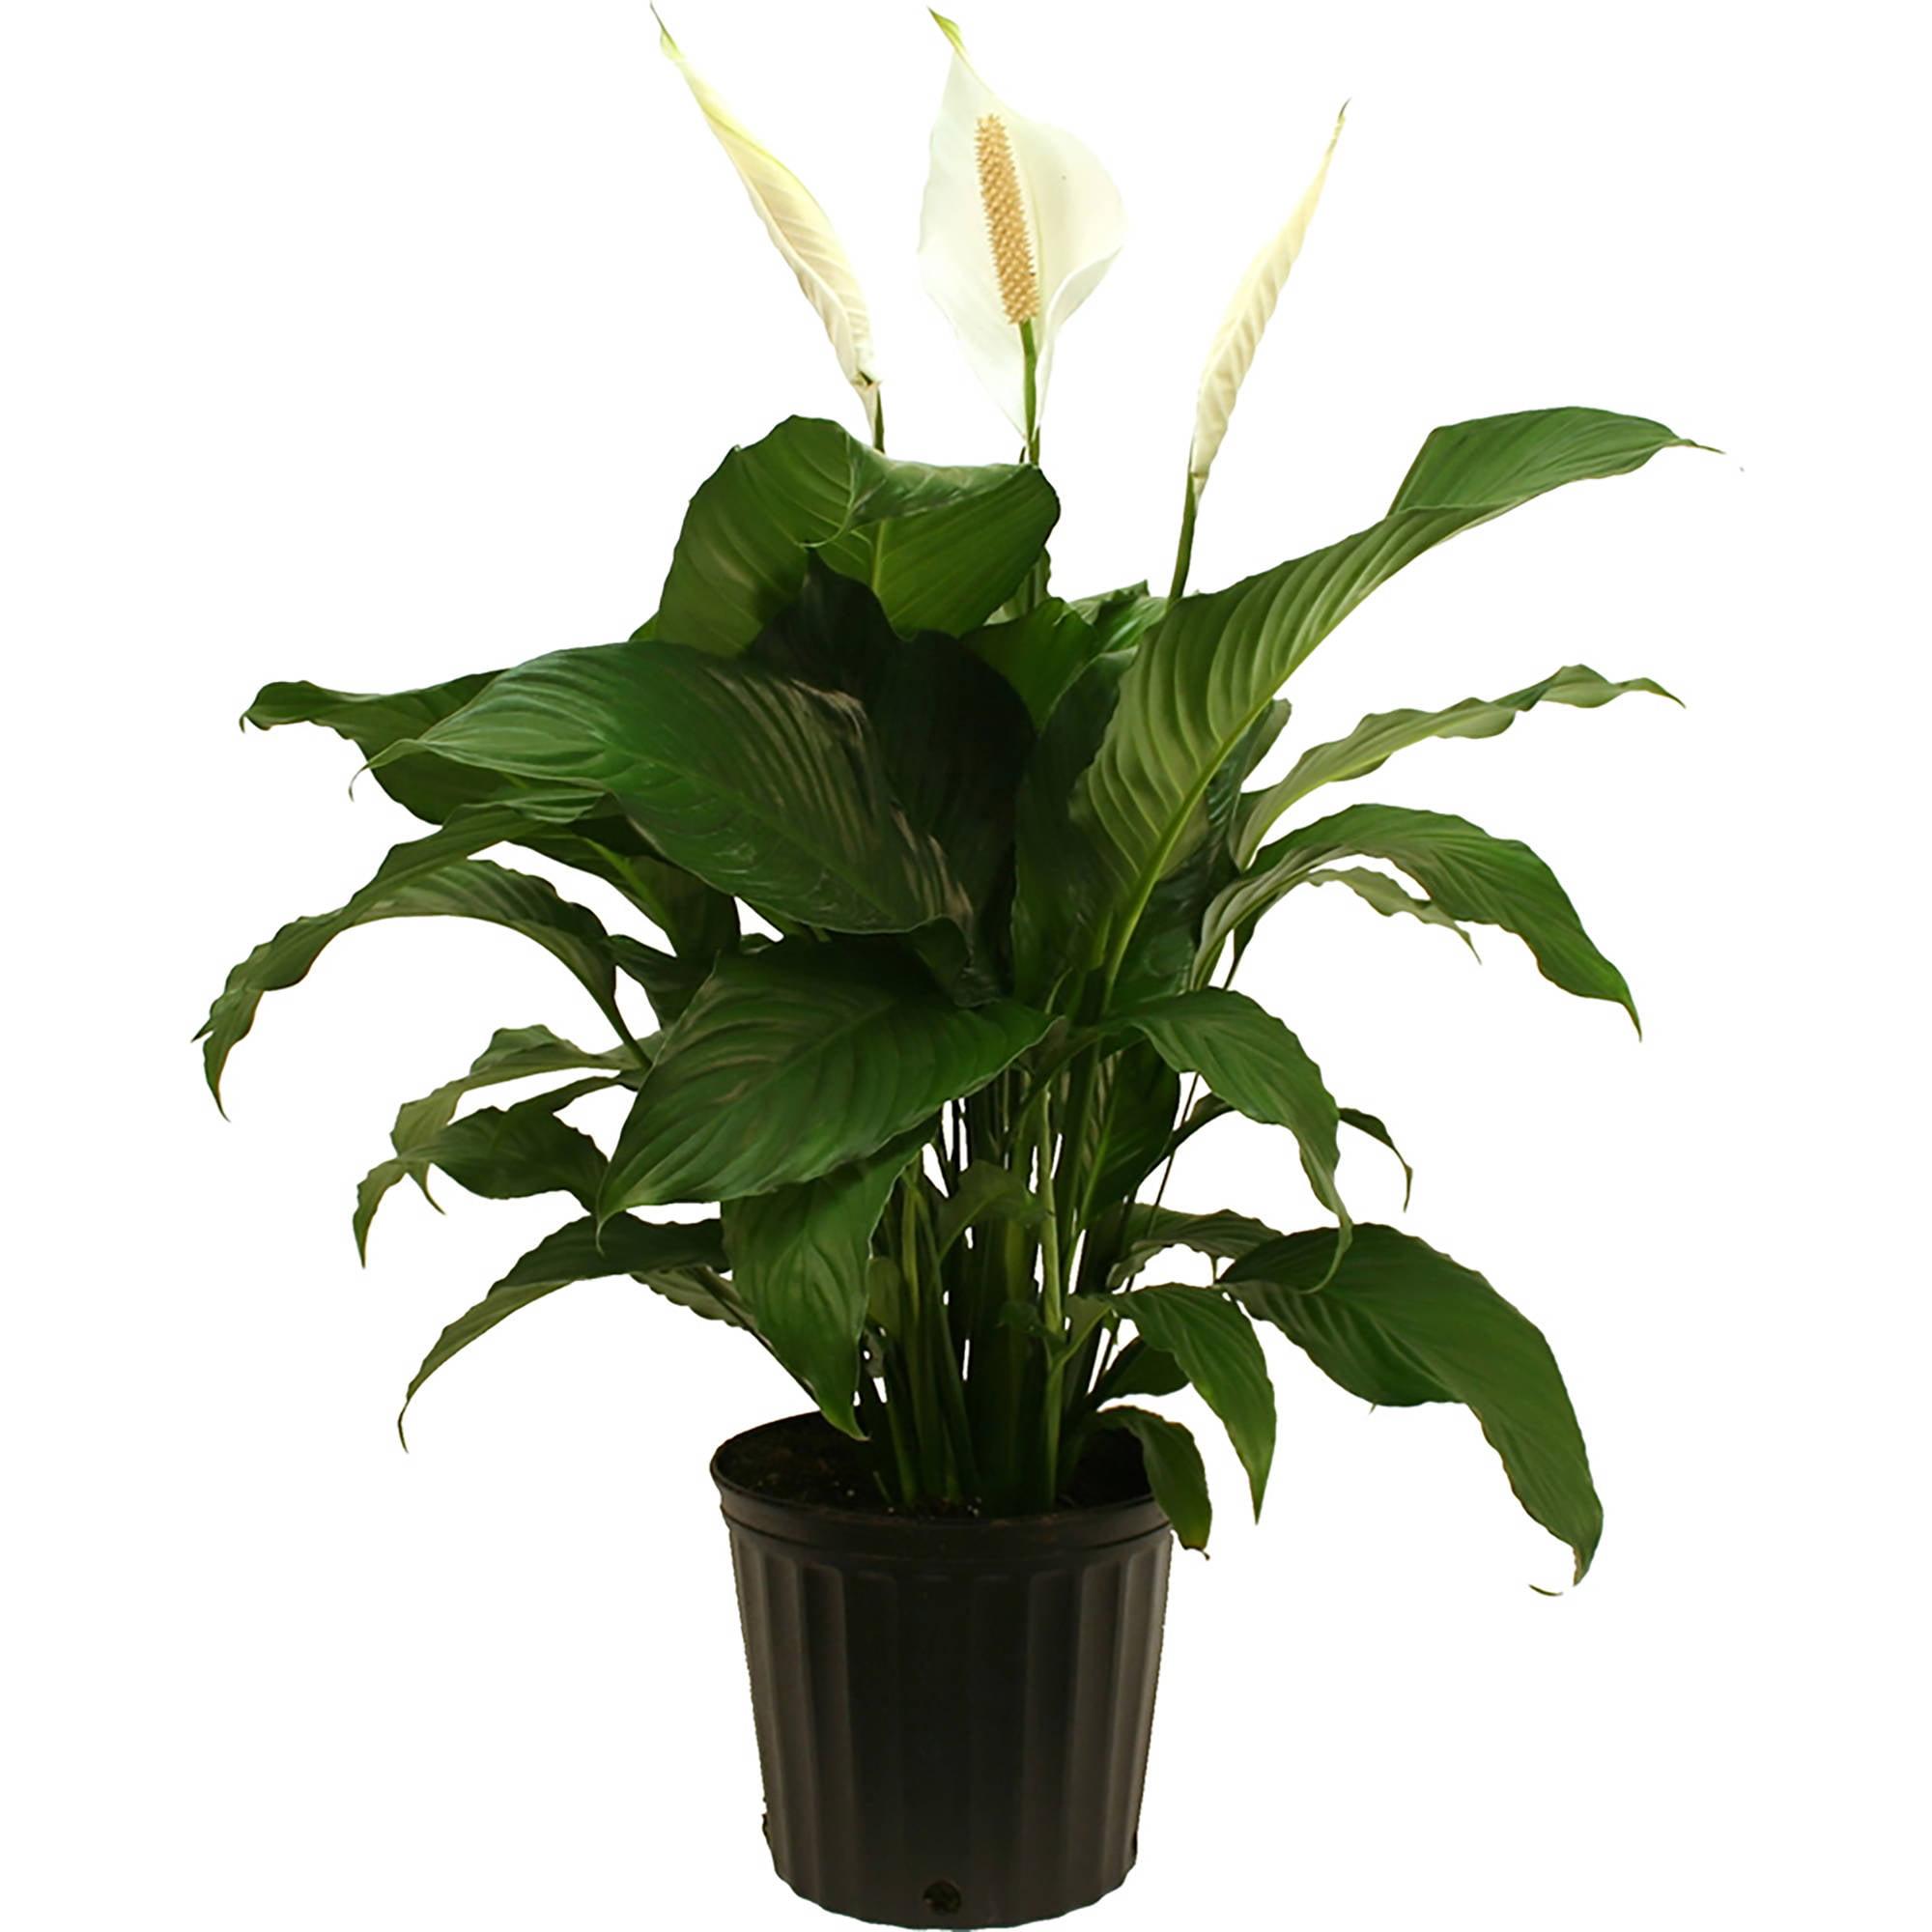 Delray plants spathiphyllum peace lily sweet pablo easy to grow delray plants spathiphyllum peace lily sweet pablo easy to grow live house plant 10 inch grower pot walmart izmirmasajfo